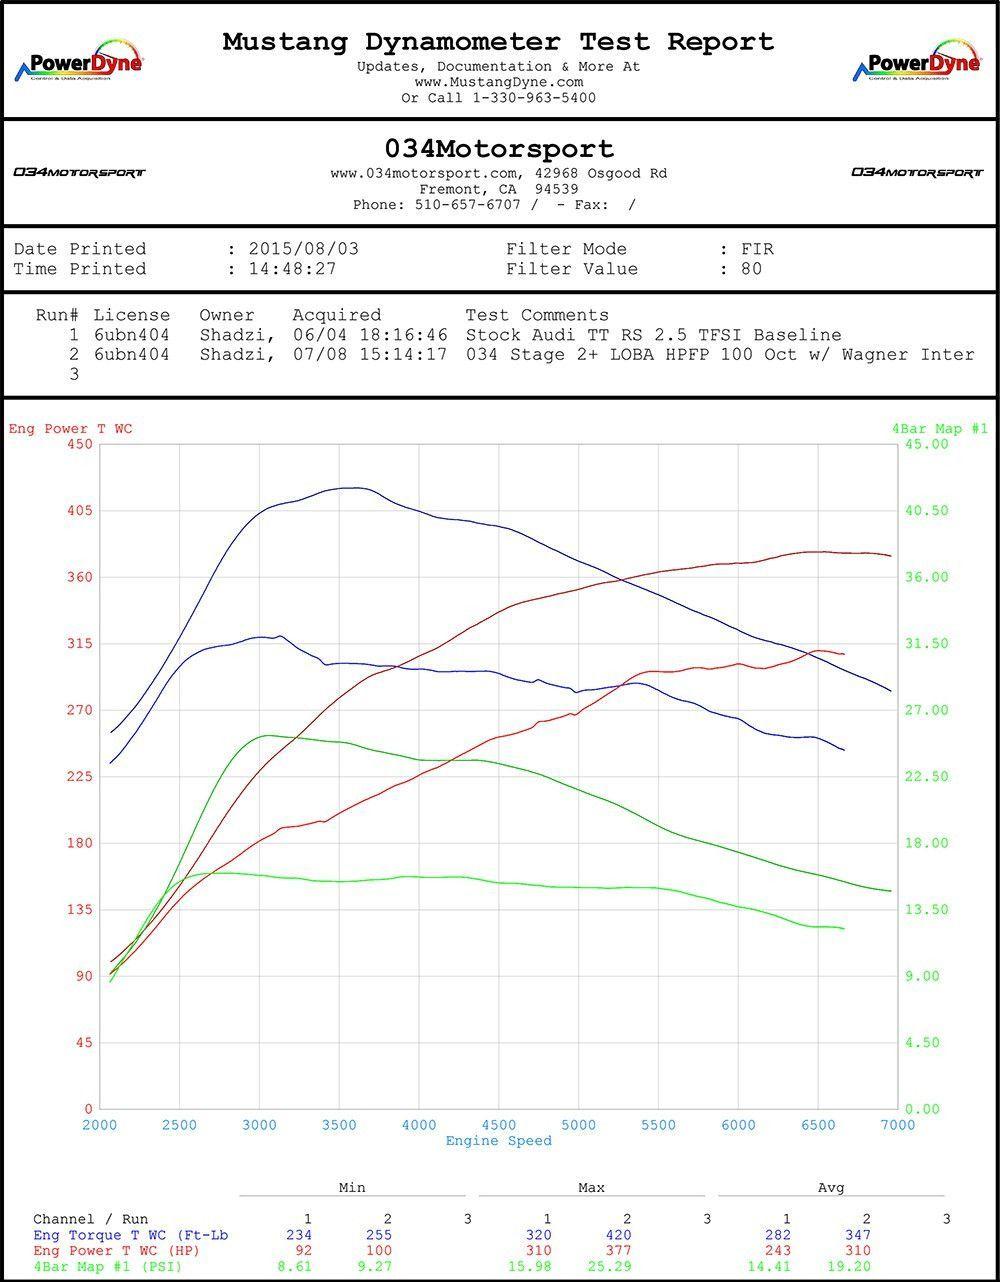 small resolution of 034motorsport audi ttrs 2 5 tfsi stage 2 hpfp ecu upgrade performance software audi turbo brakes turbokit bsh ledlights coilpacks apr ctsturbo